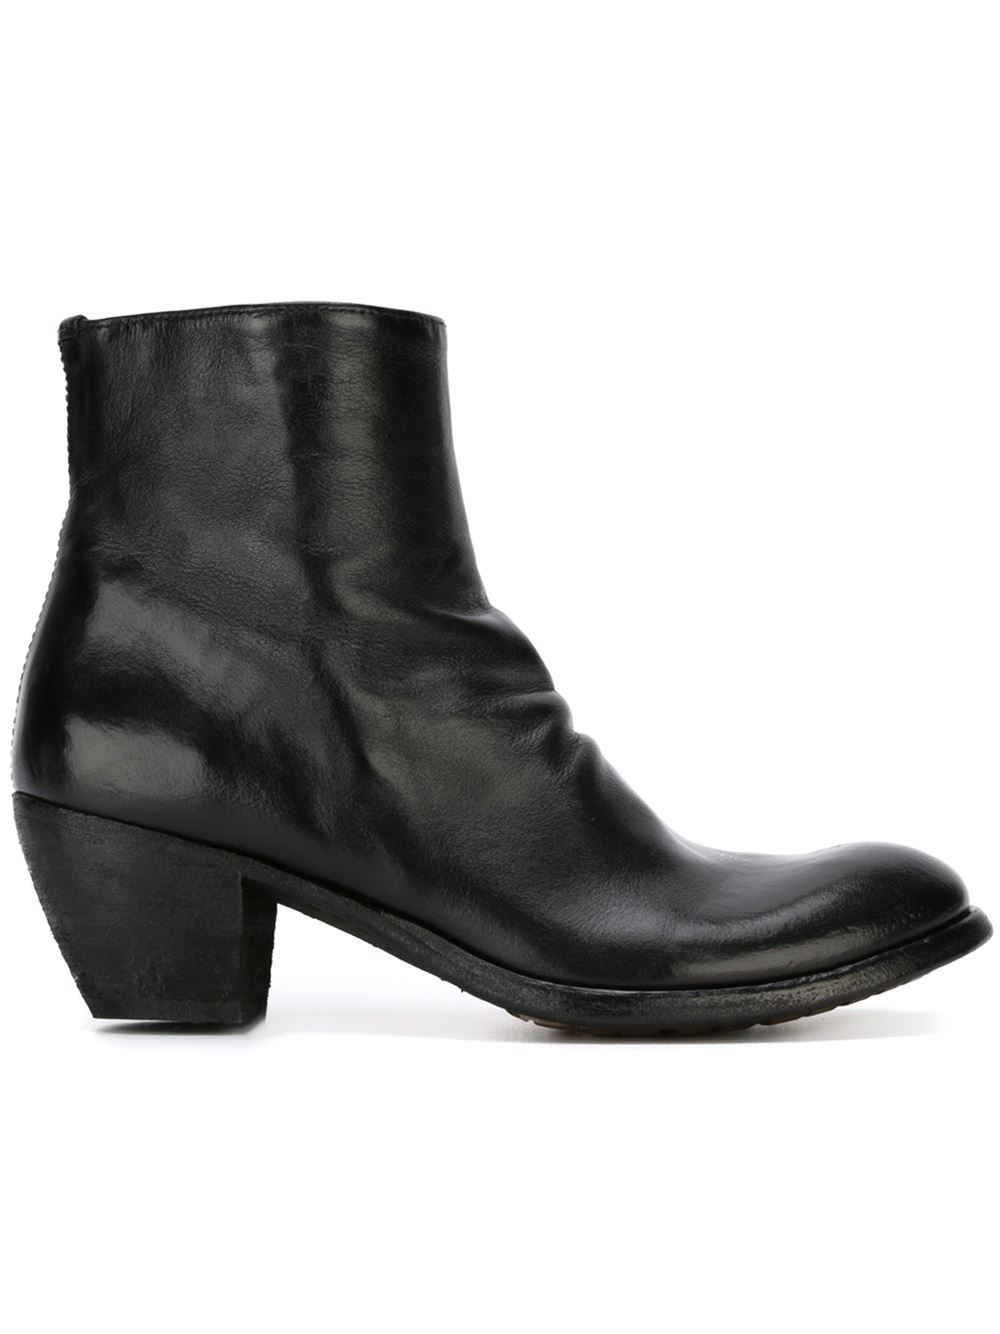 Elegant Officine Creative U0026#39;godardu0026#39; Ankle Boots In Brown   Lyst